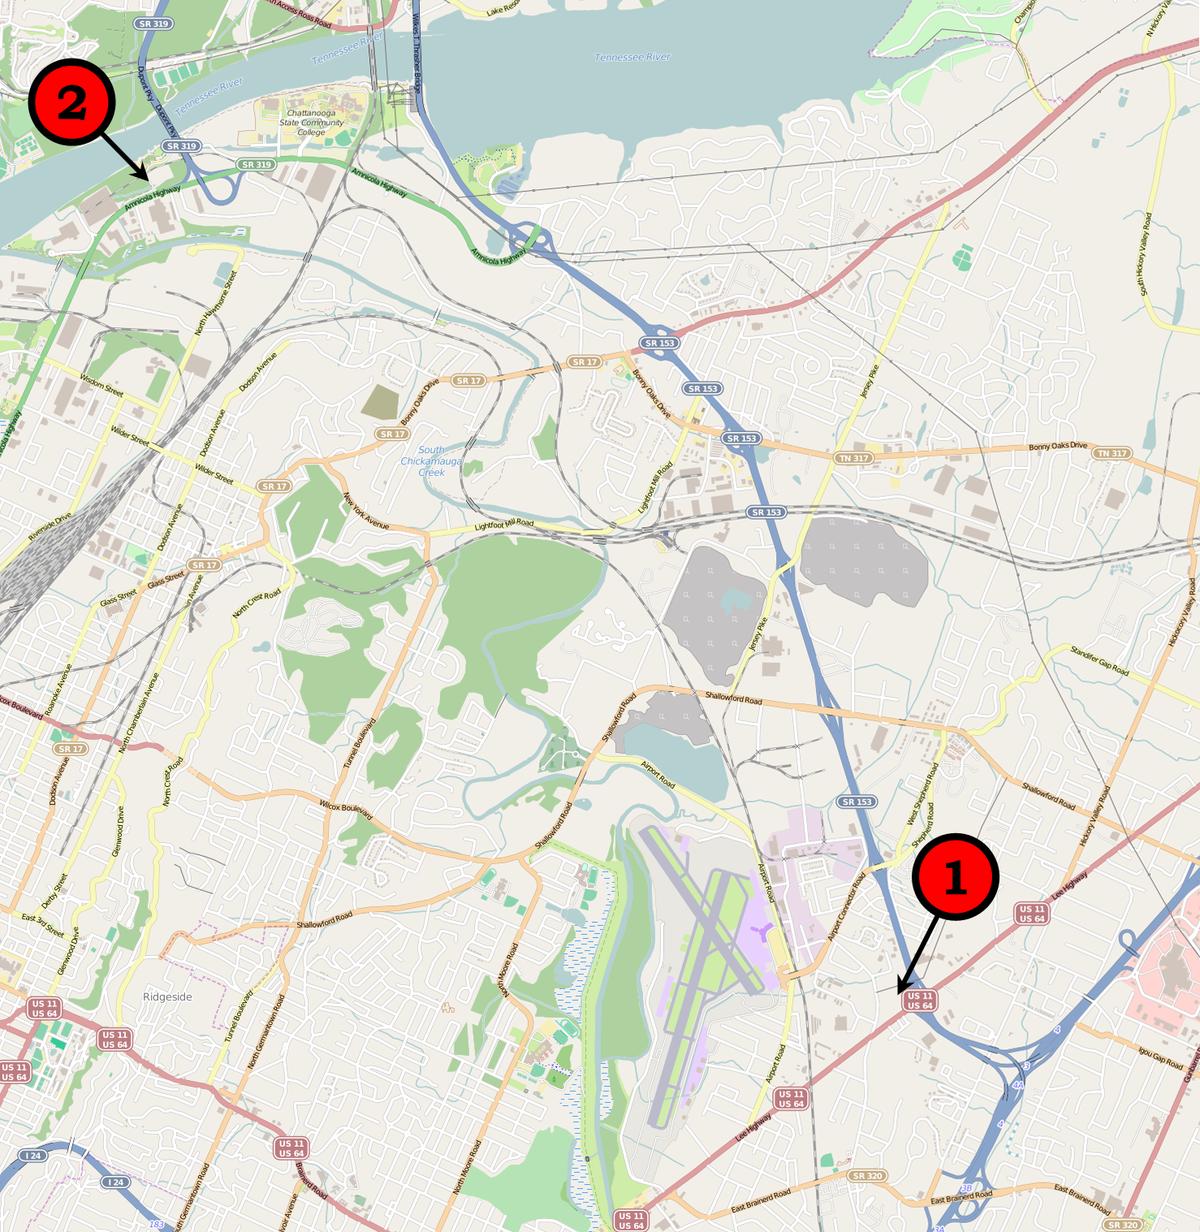 2015 Chattanooga shootings - Wikipedia on